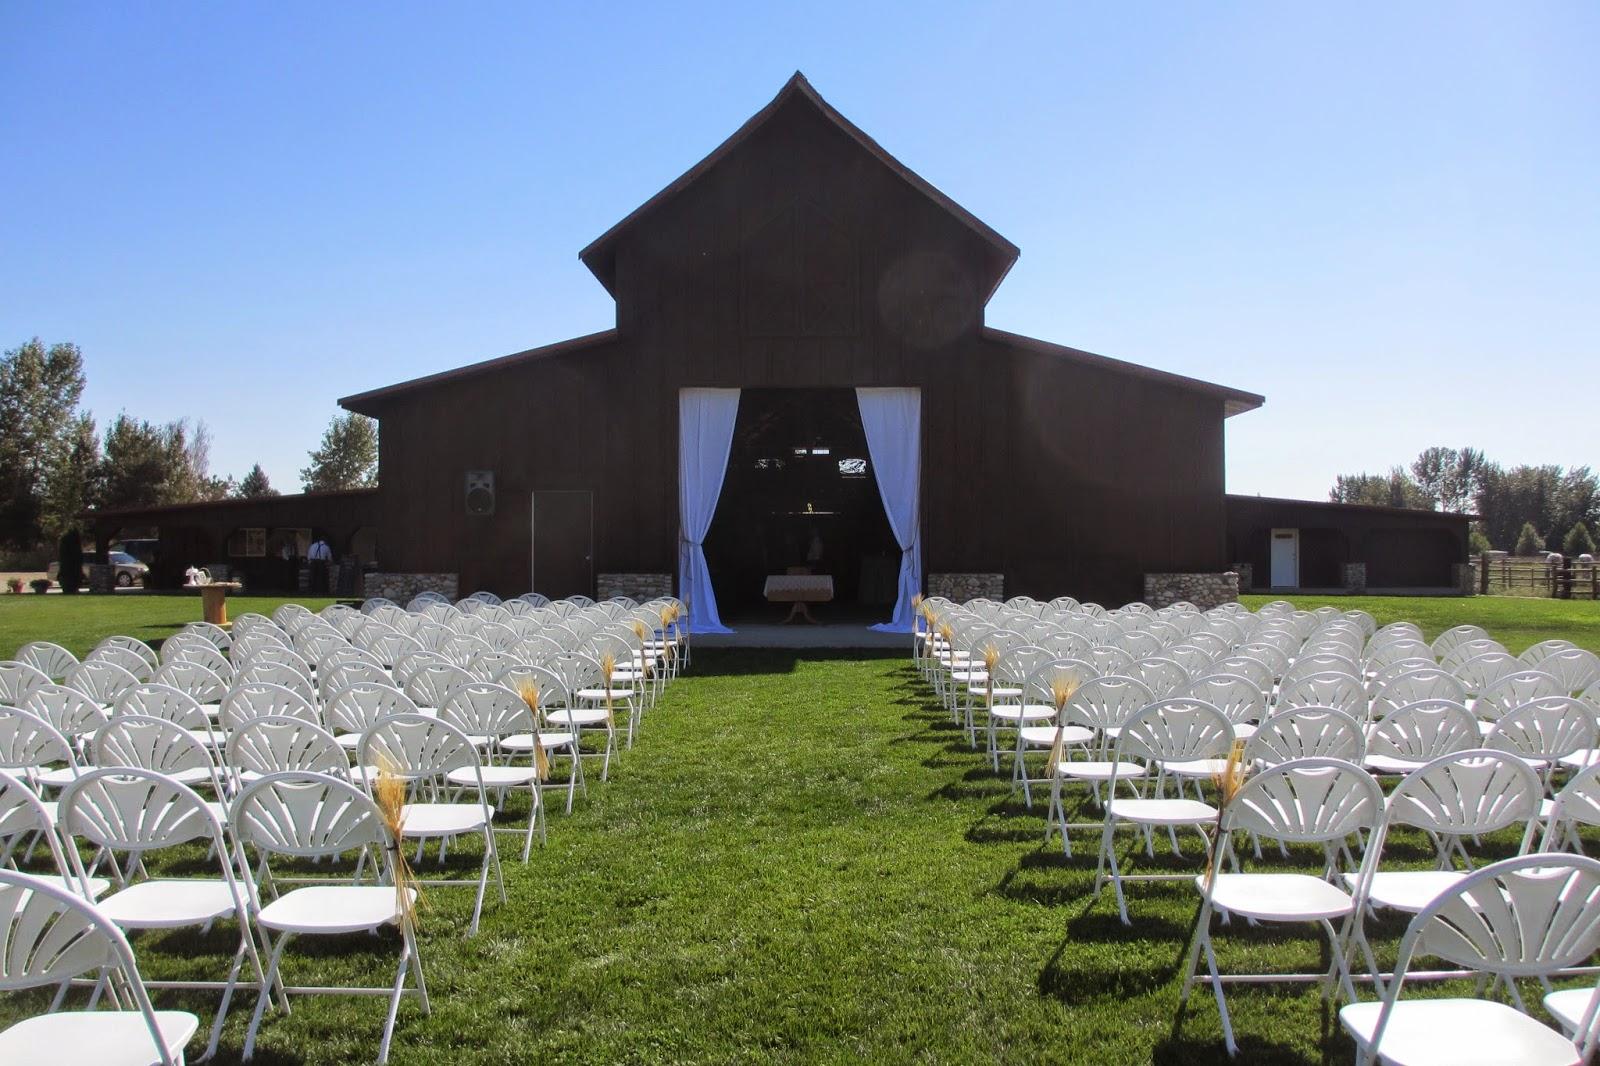 idaho ceremonies wedding officiant